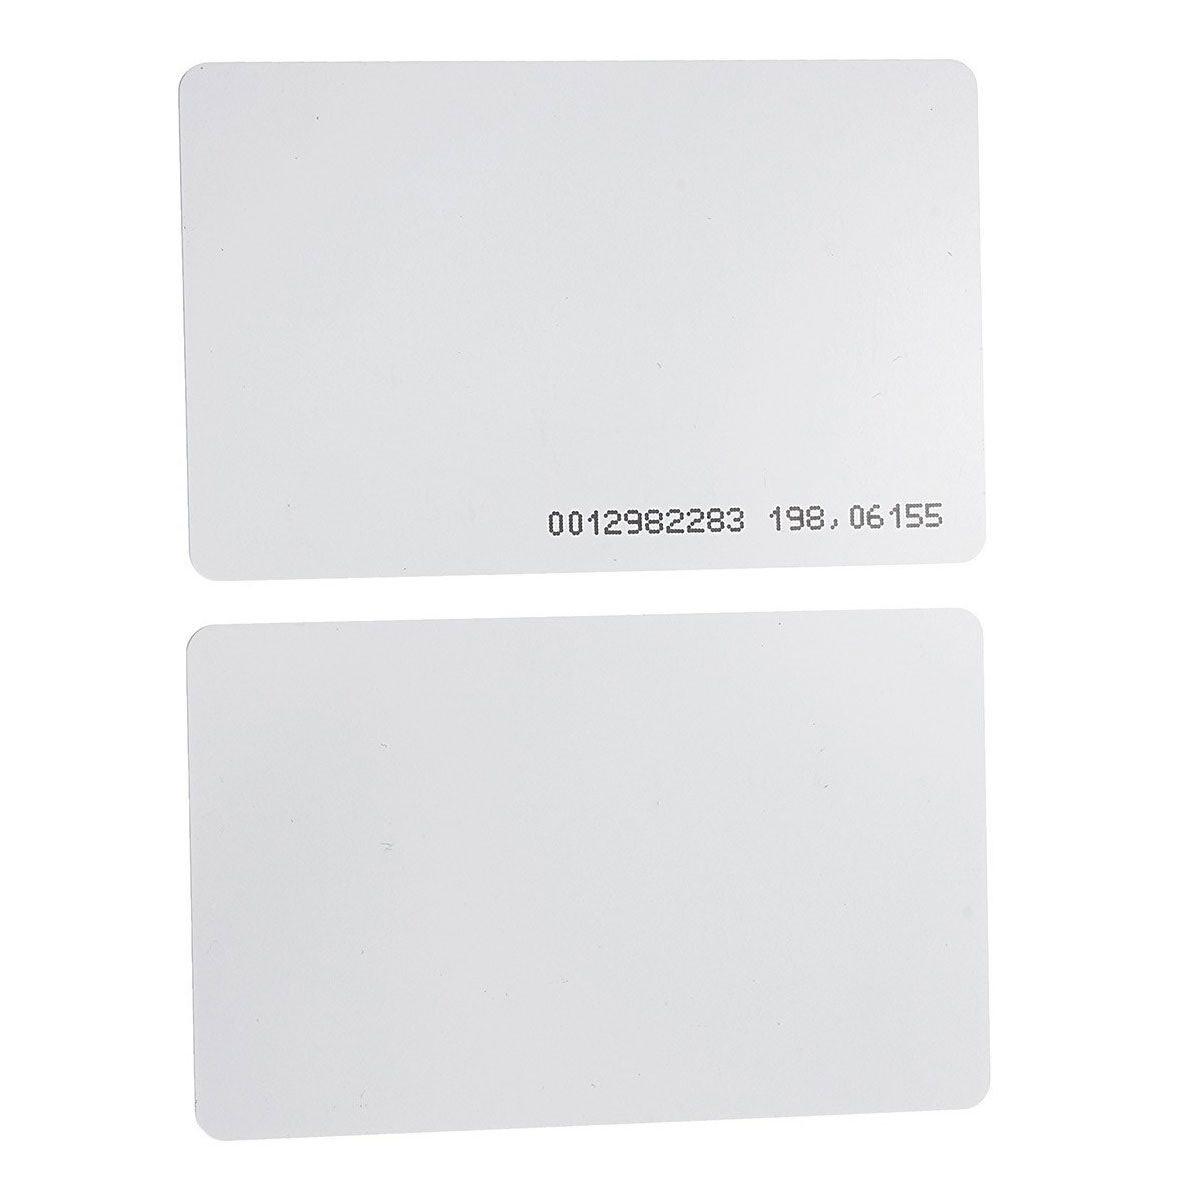 Cartão RFID 125 KHz PVC - 100 unidades